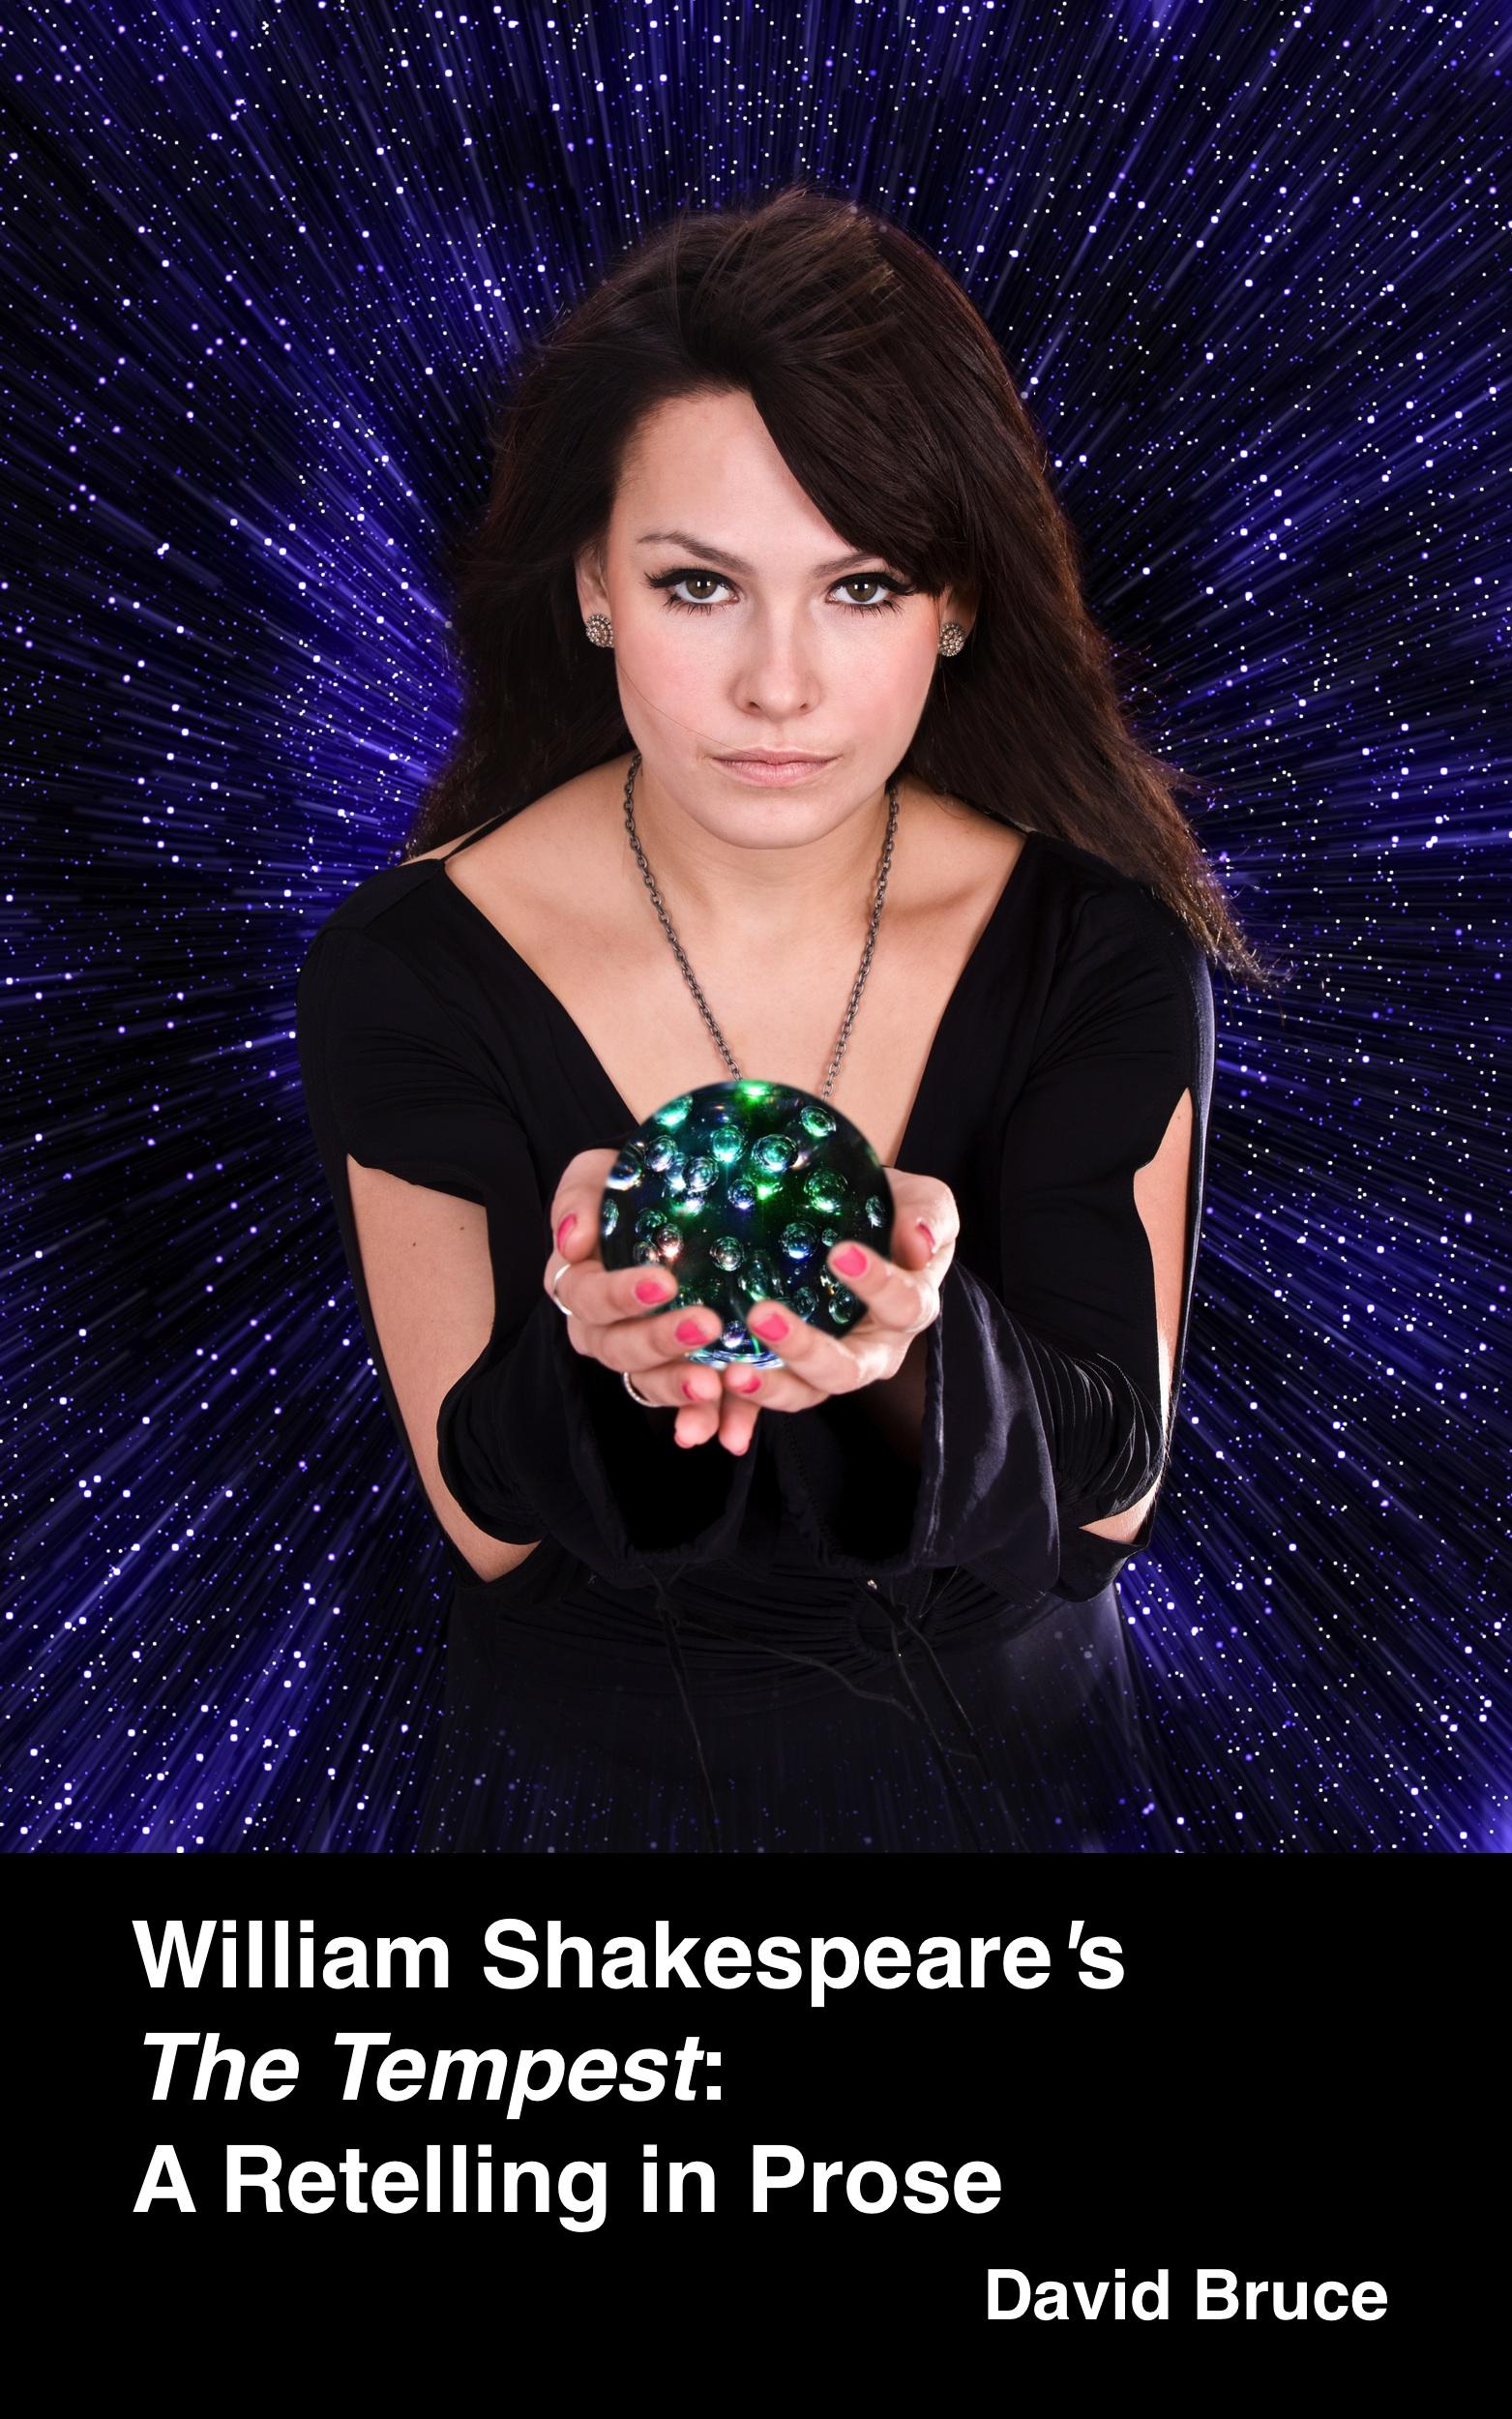 David Bruce - William Shakespeare's The Tempest: A Retelling in Prose